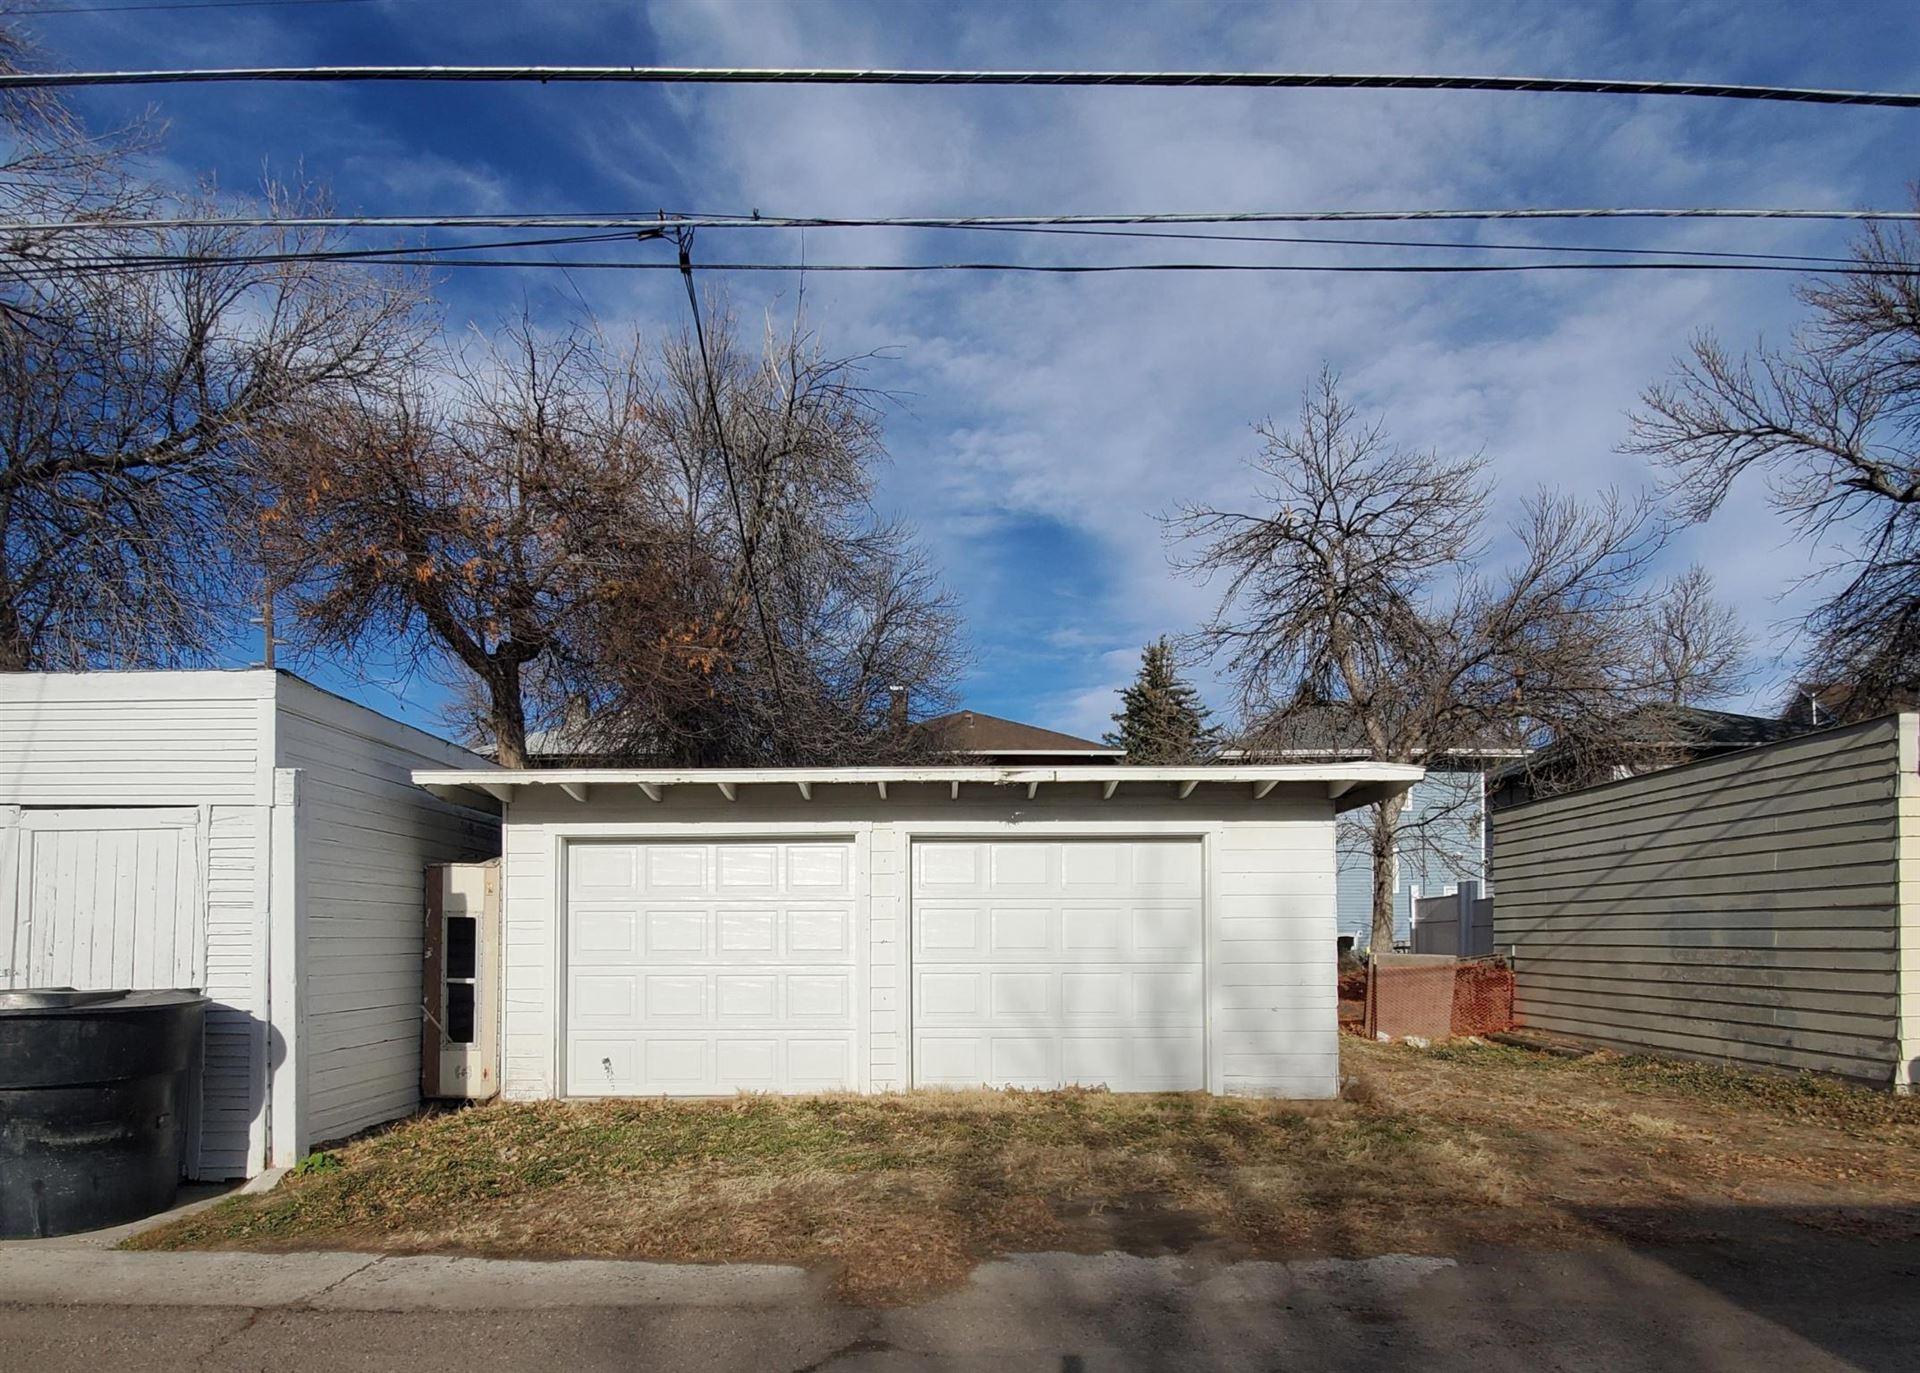 Photo of 908 3rd Avenue North, Great Falls, MT 59401 (MLS # 22018225)